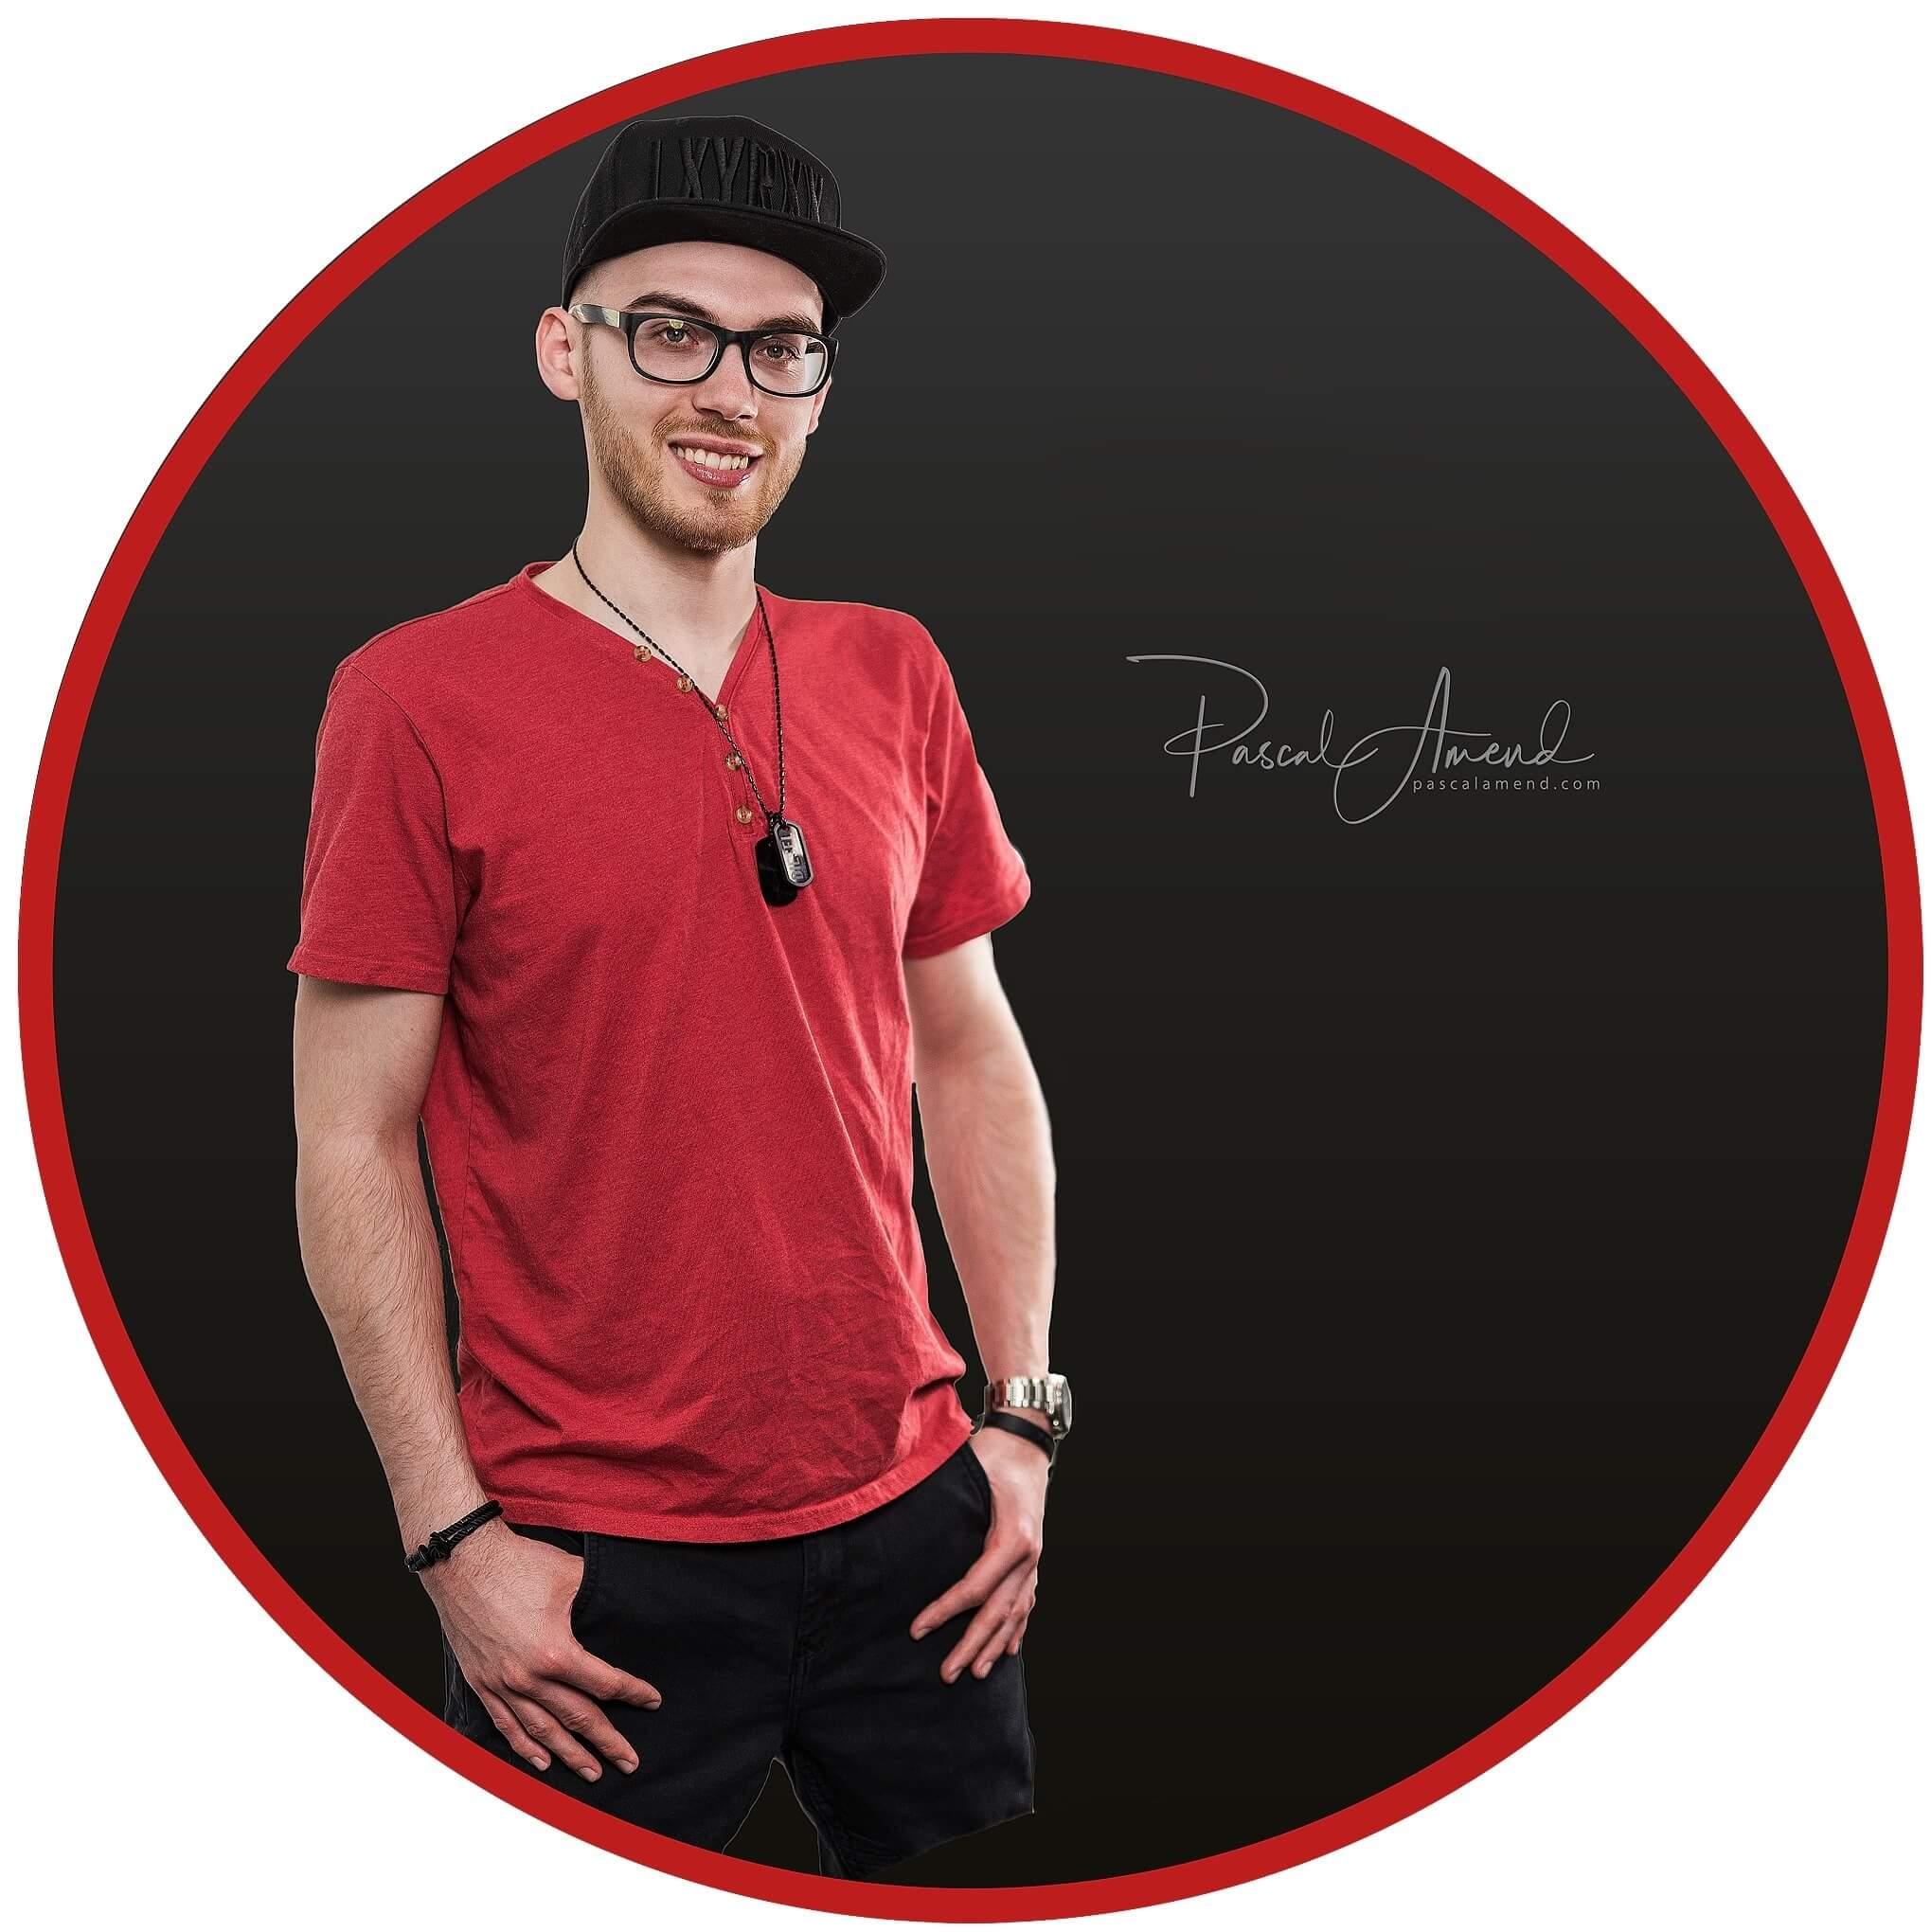 Pascal Amend - Jamie Lee Arnold - Fotografin & Präsenzexpertin